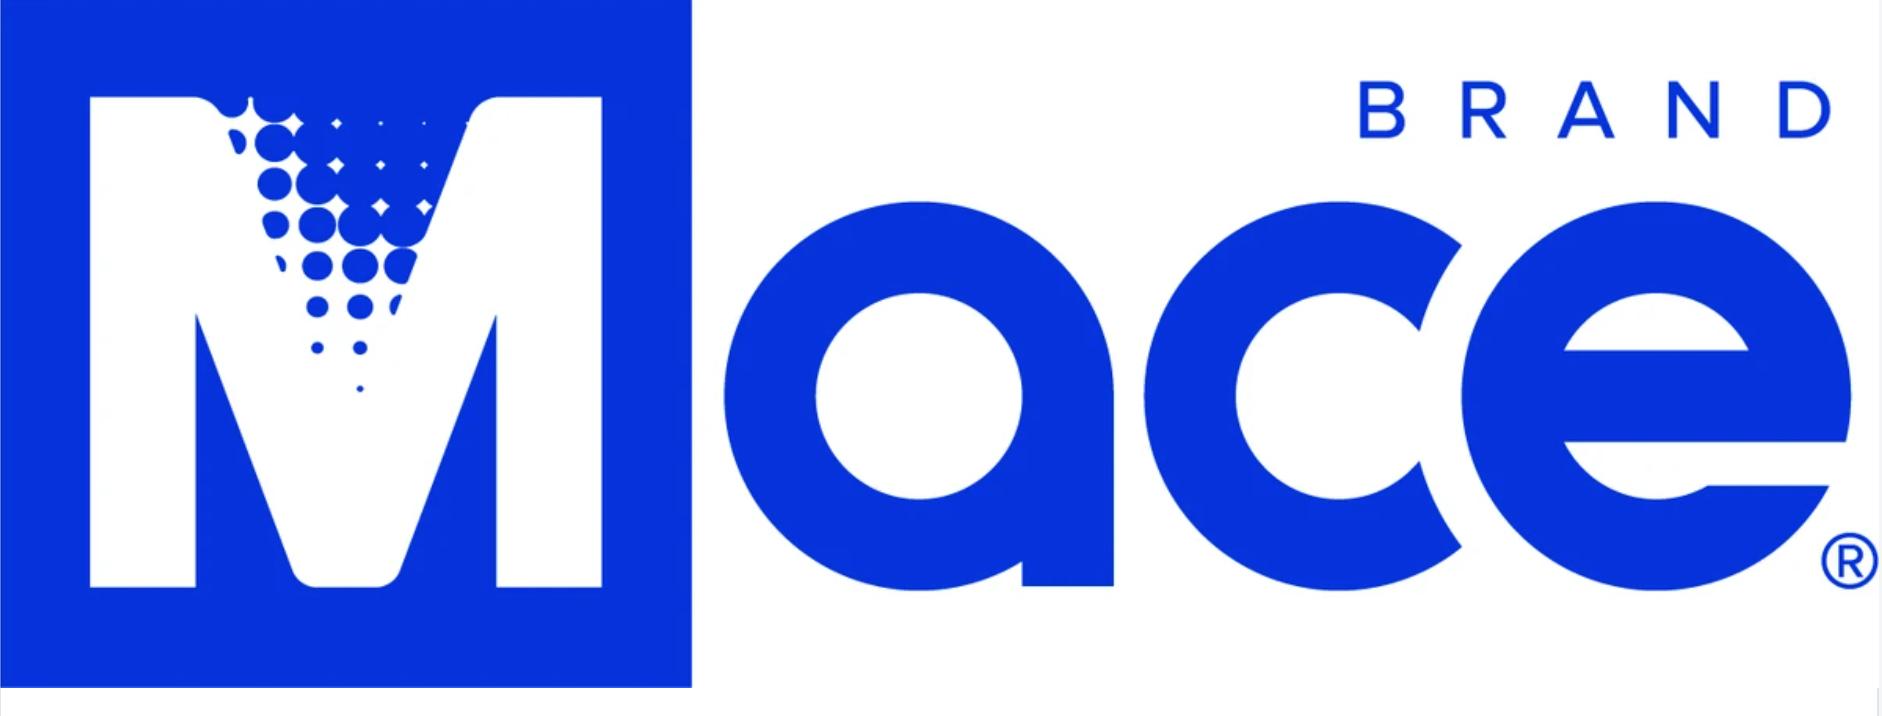 Mace Brand logo